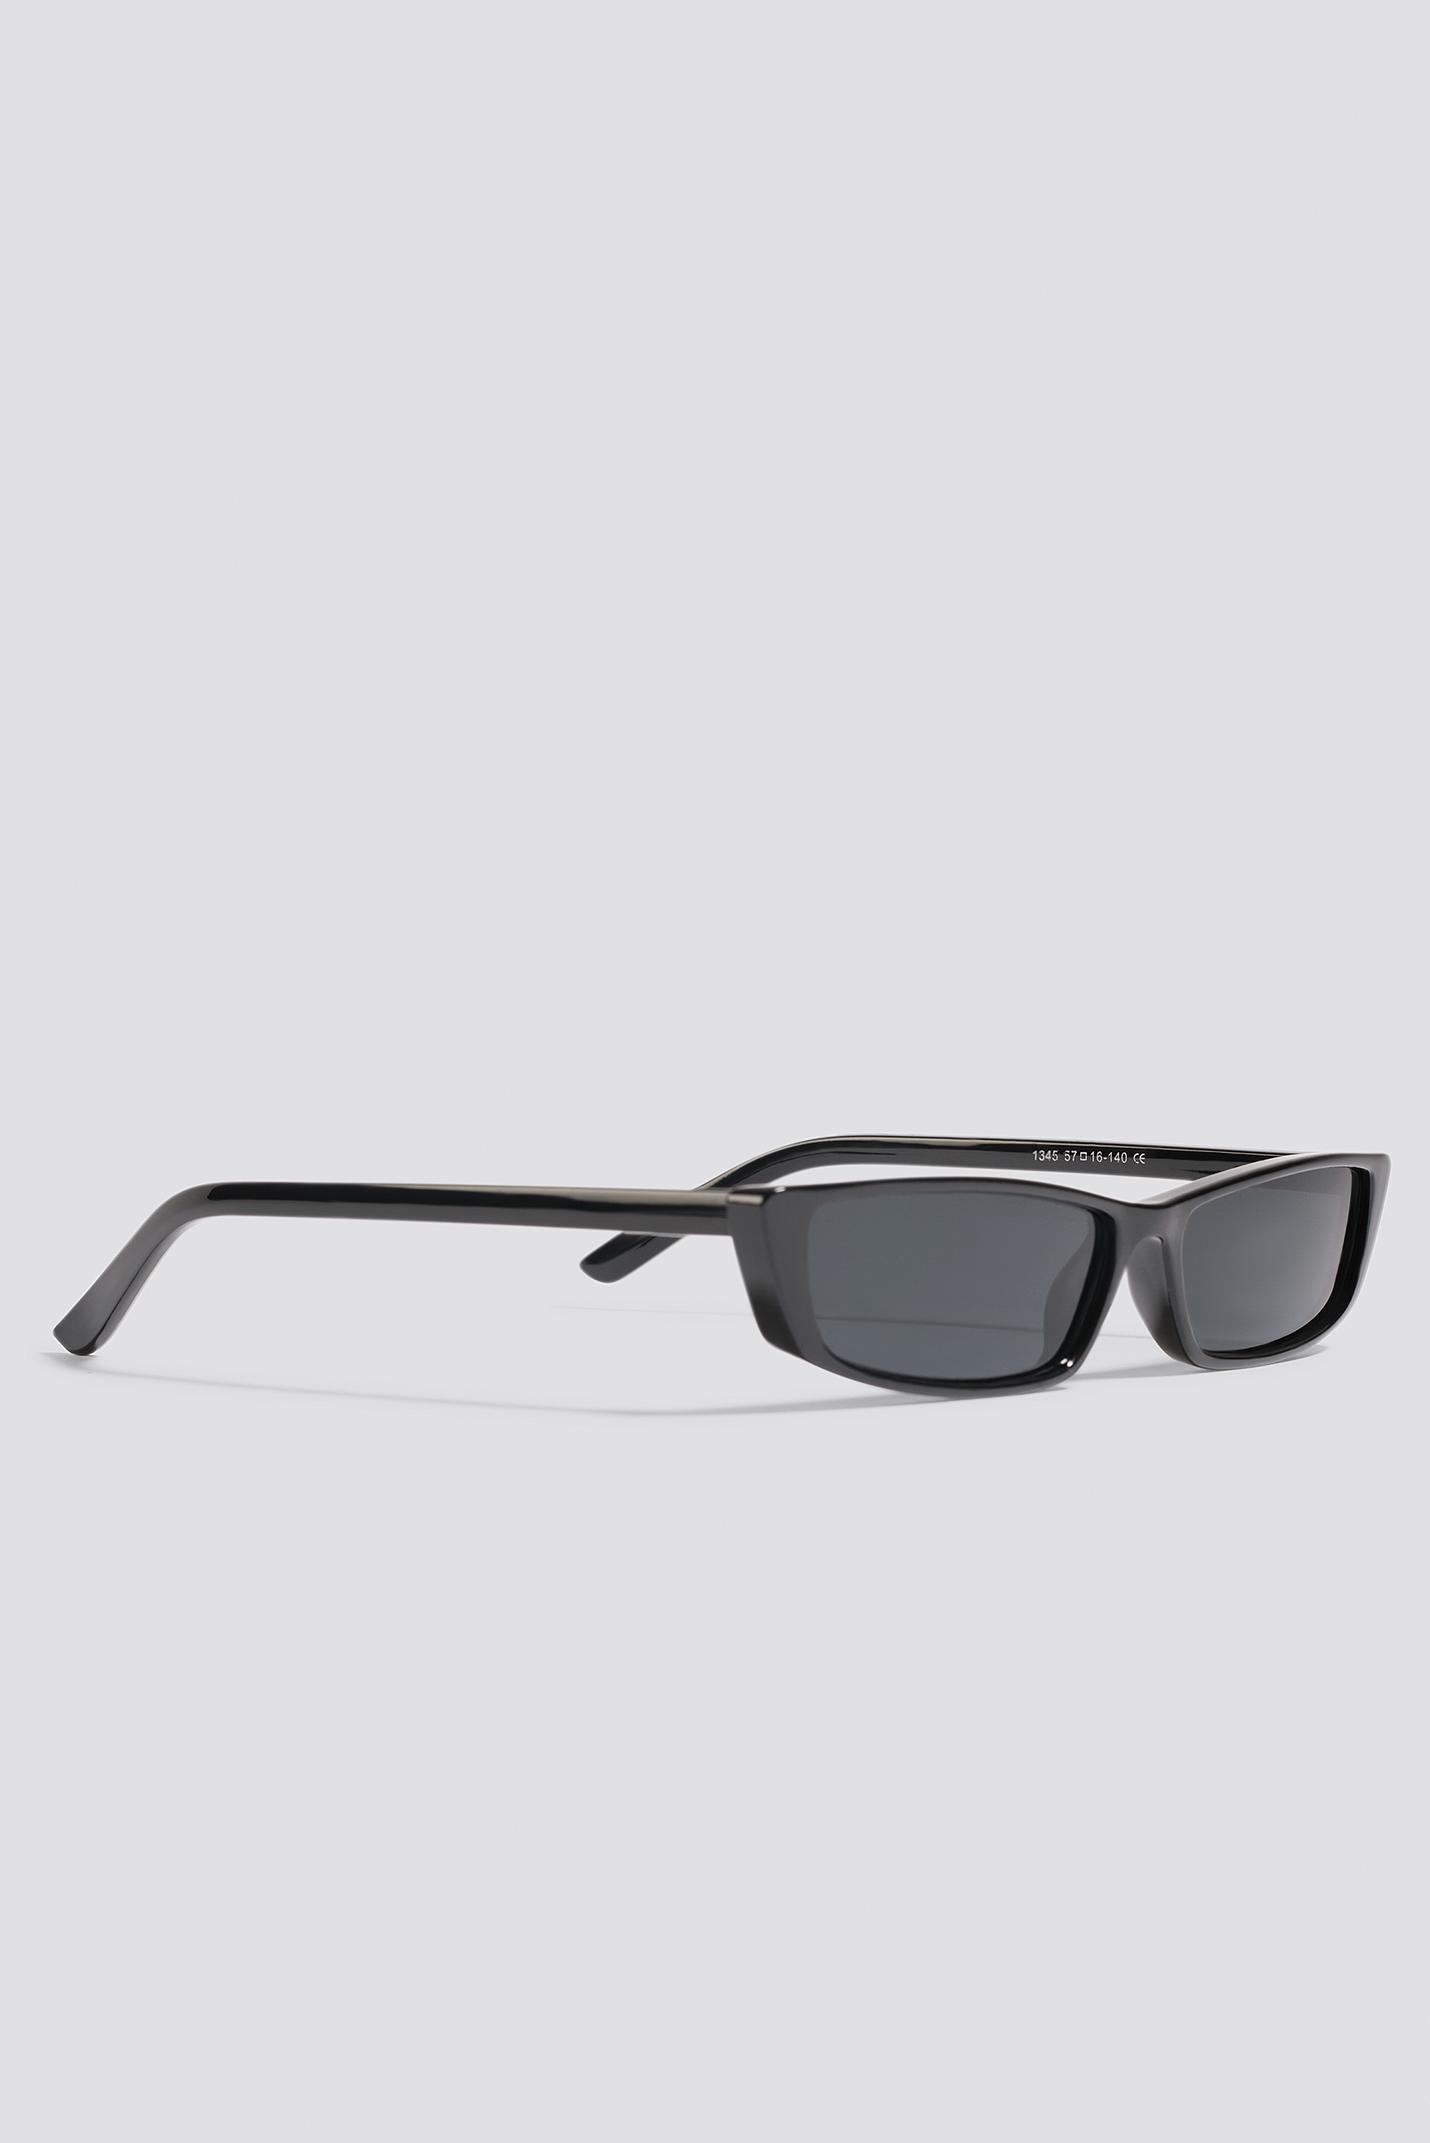 NA-KD Accessories Wide Rectangle Sunglasses - White kmFLcnPs